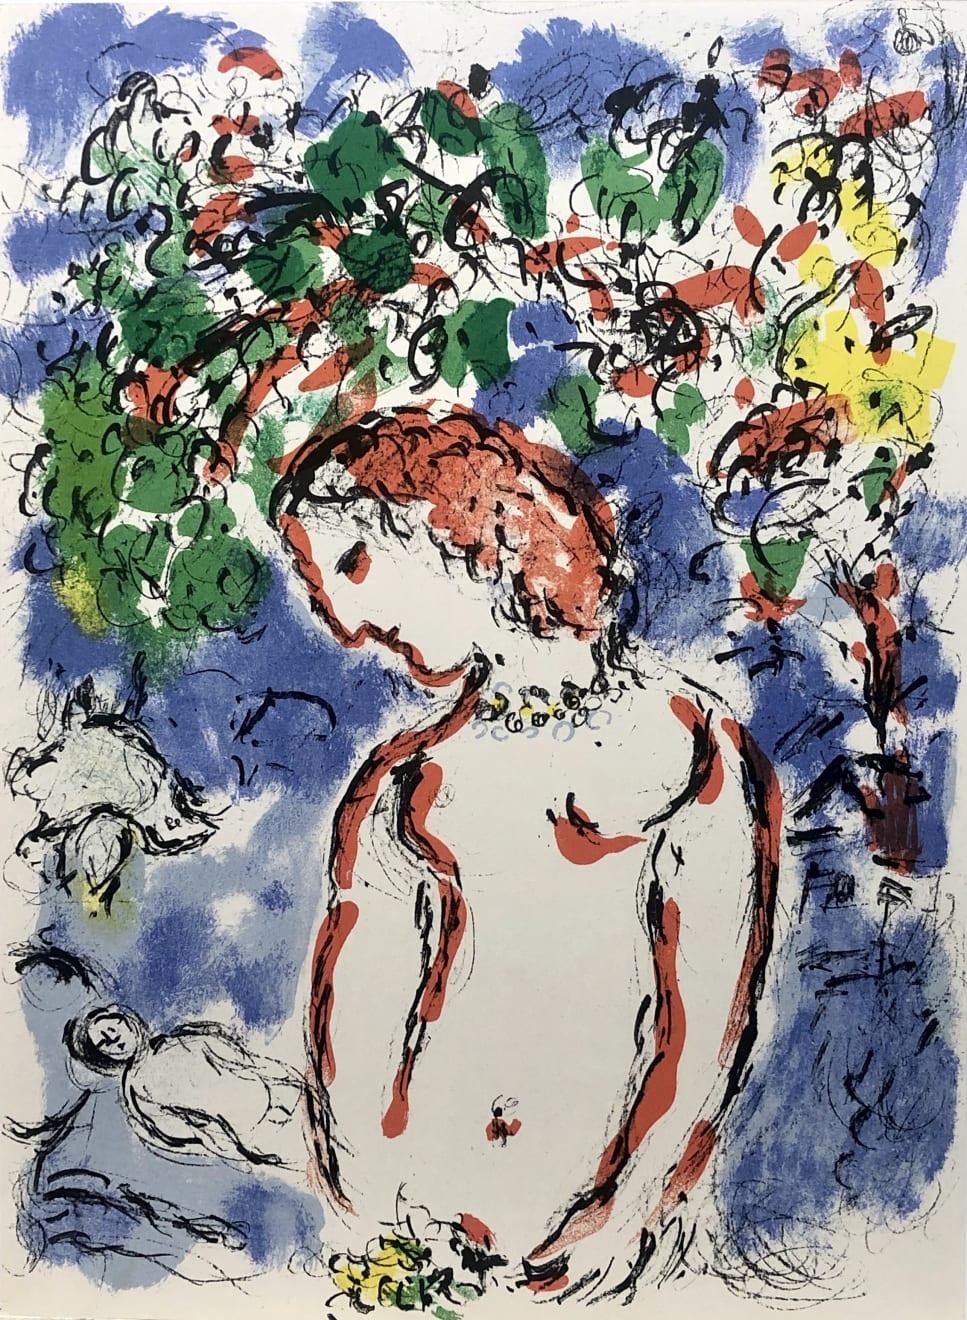 Summer Auction 2020, LOT 24 - Marc Chagall - 'From Derrière Le Miroir', 1972